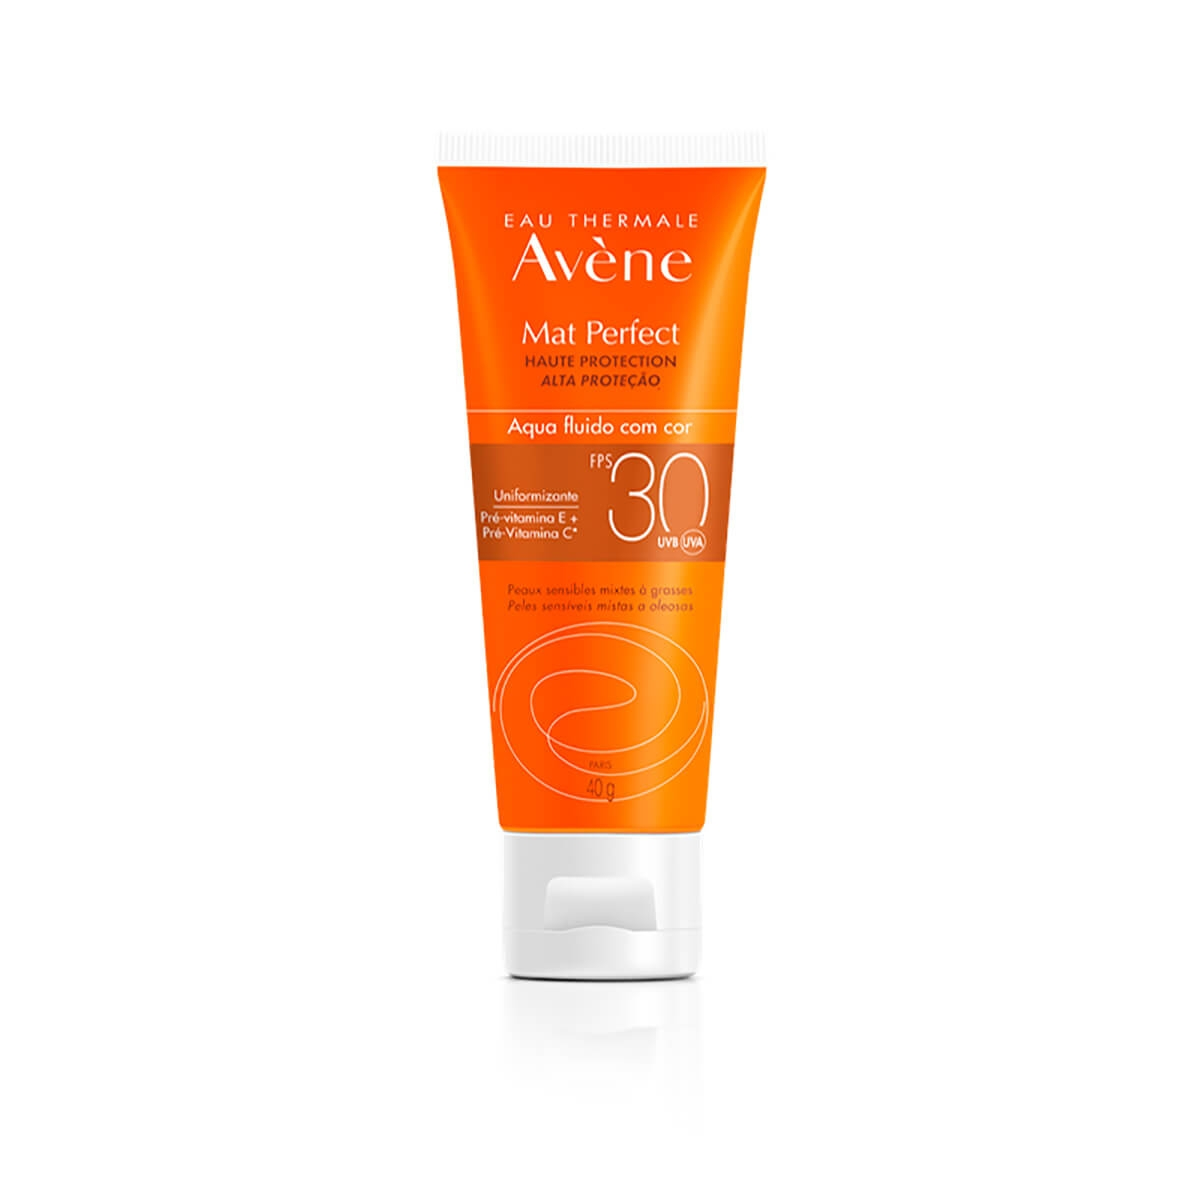 Protetor Solar Facial Avène Mat Perfect Aqua-Fluido com Cor FPS30 com 40g 40g